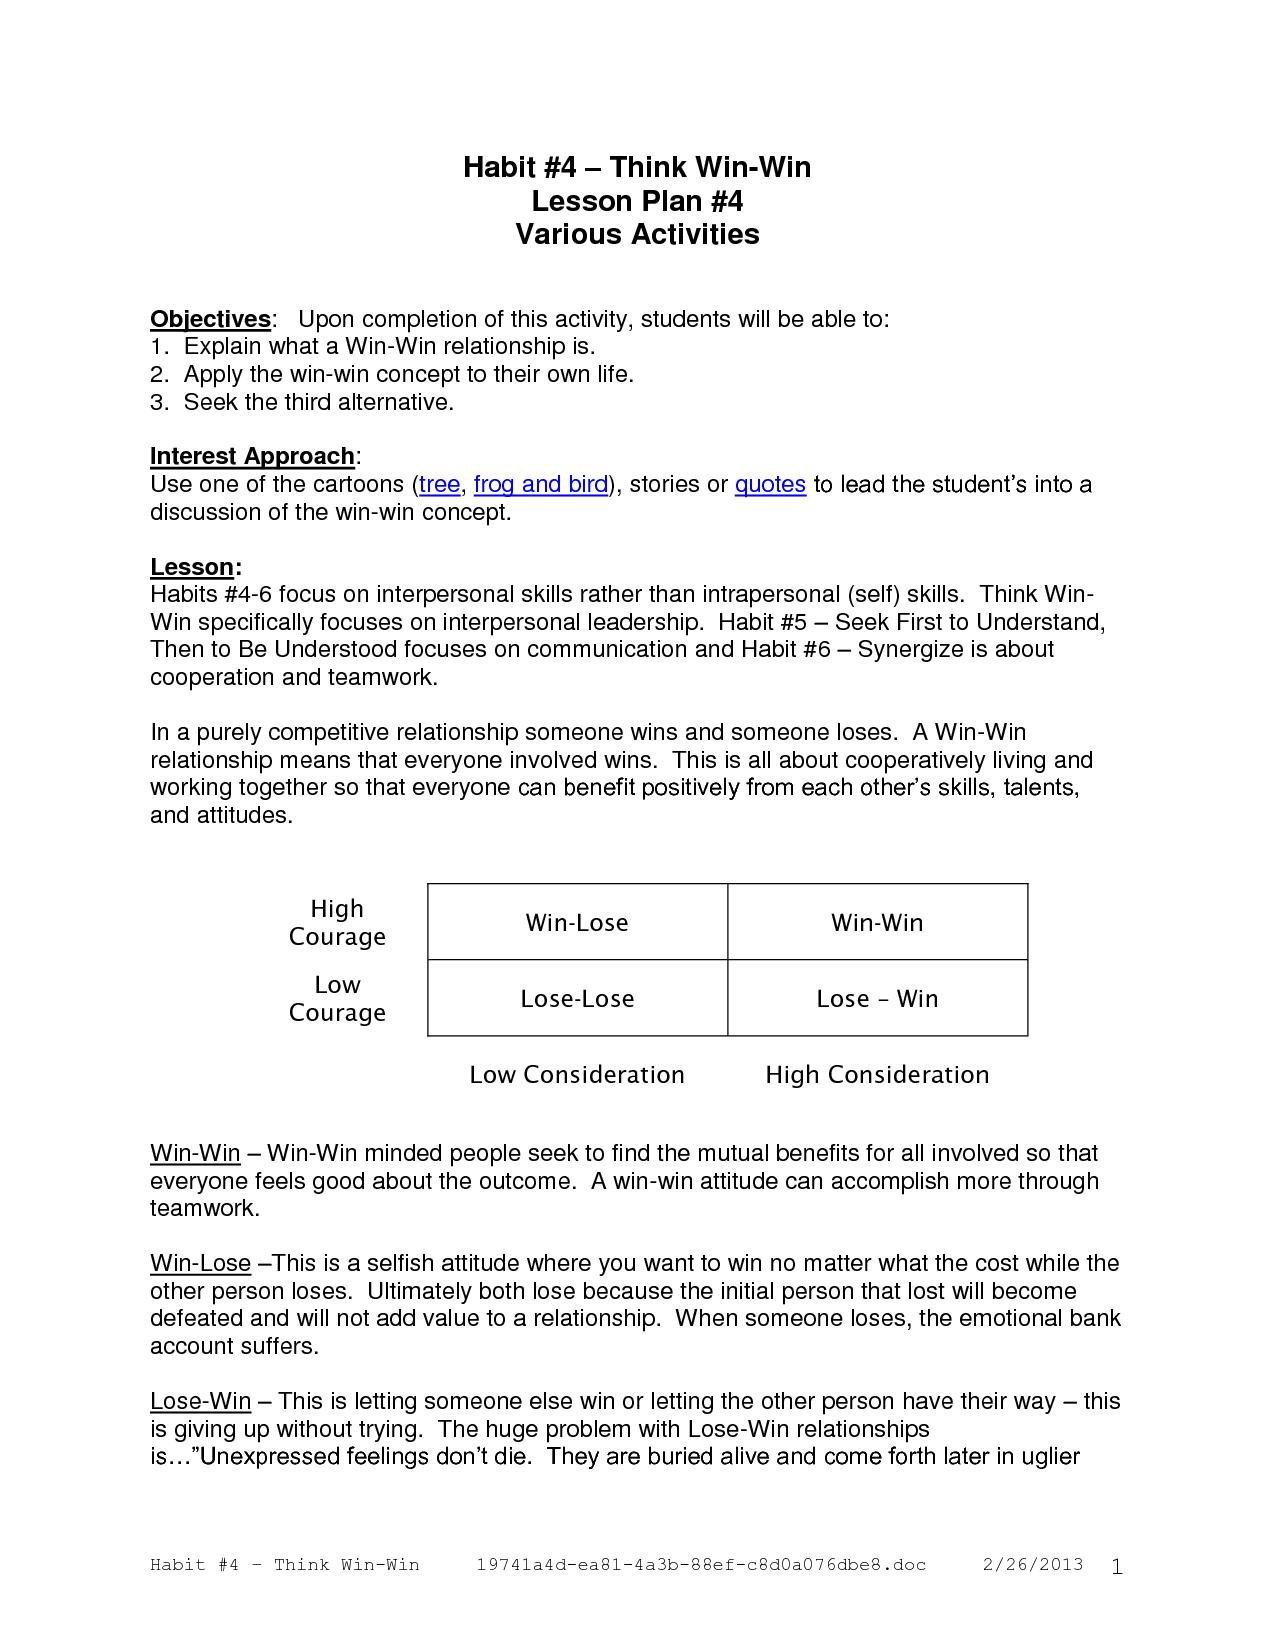 Think WinWin Activities  Lesson   Olympia Community Schools